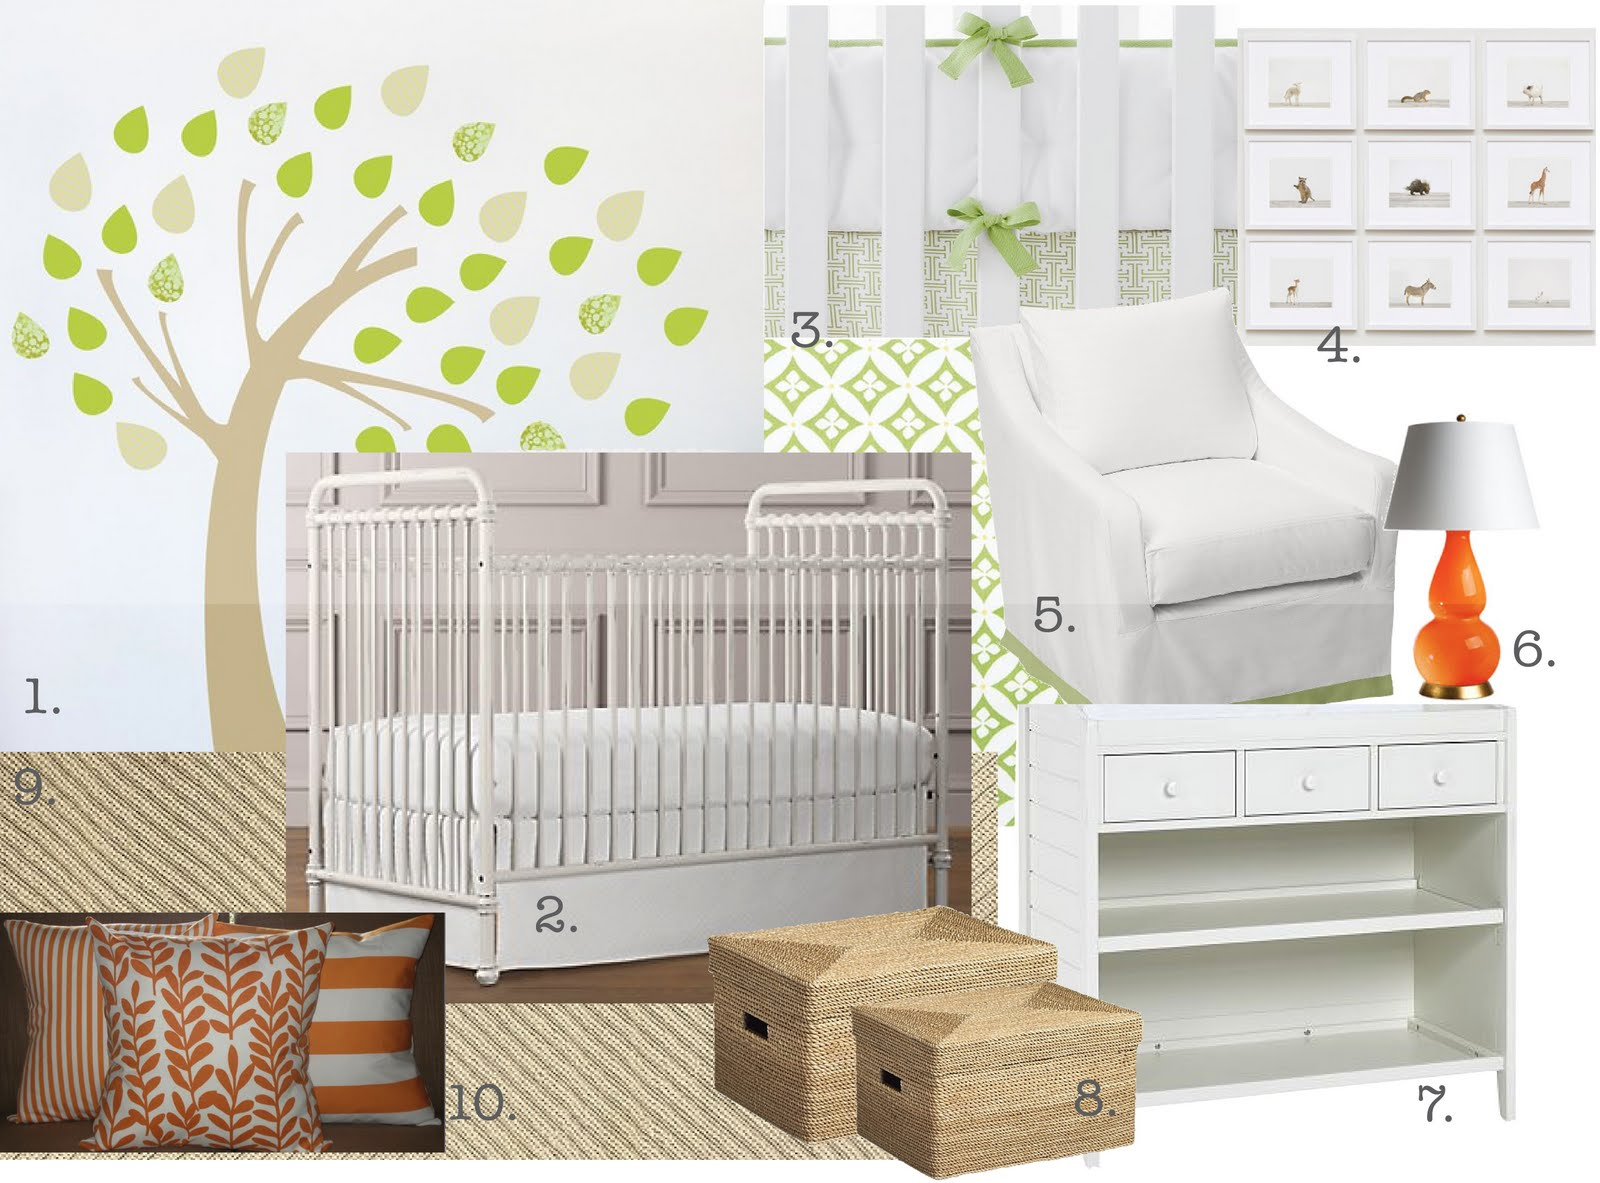 Design Studio B Neutral Baby Room Design